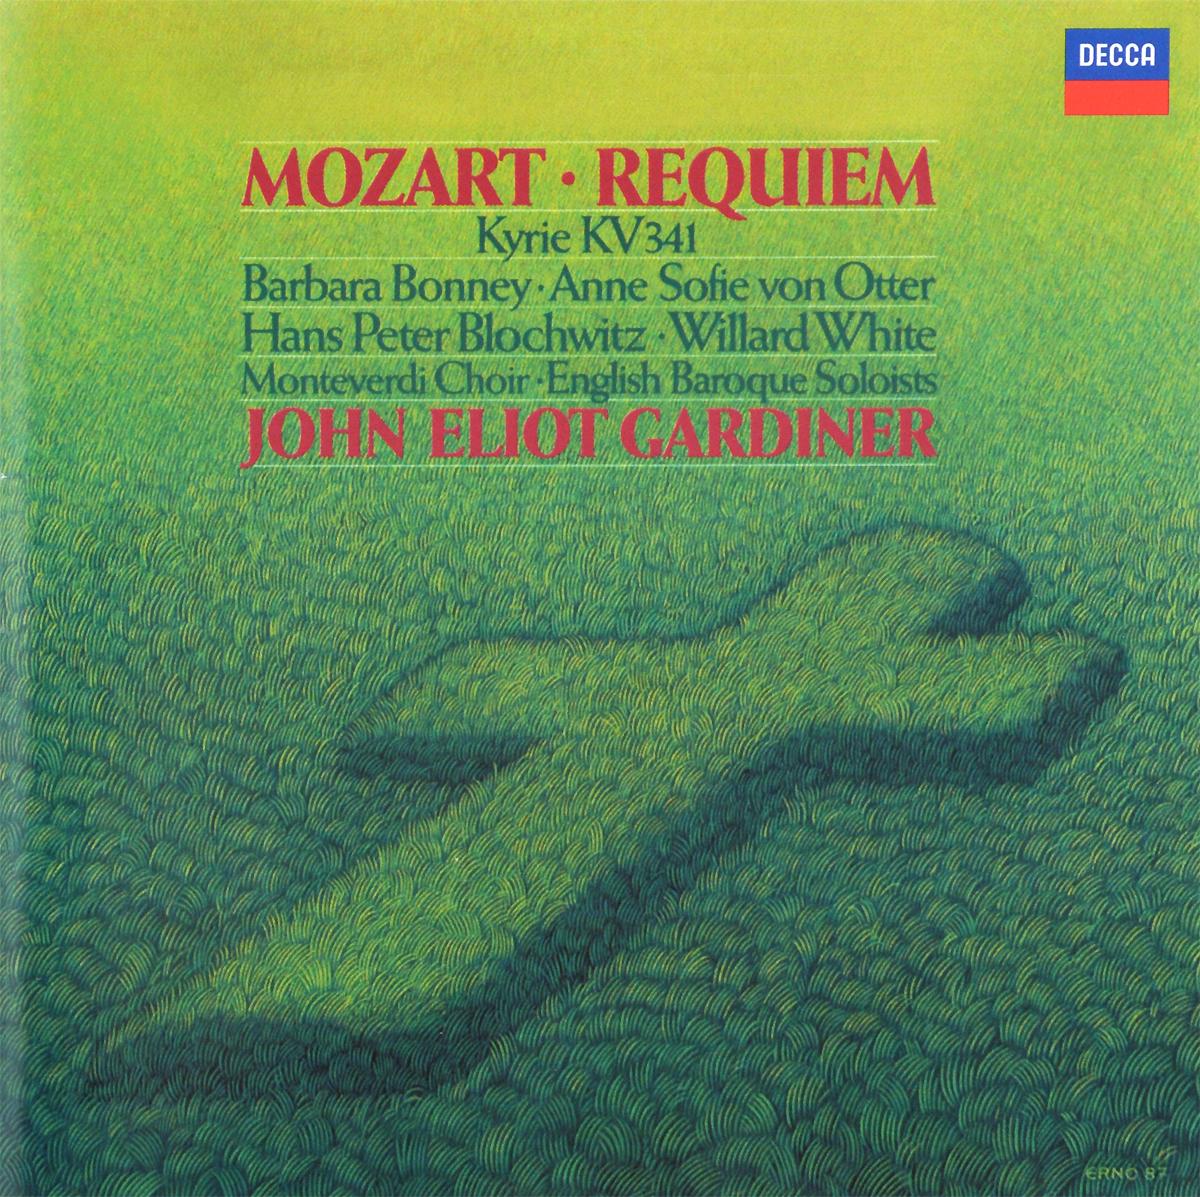 Джон Элиот Гардинер,The English Baroque Soloists John Eliot Gardiner. Mozart. Requiem / Kyrie KV 341 mozart requiem